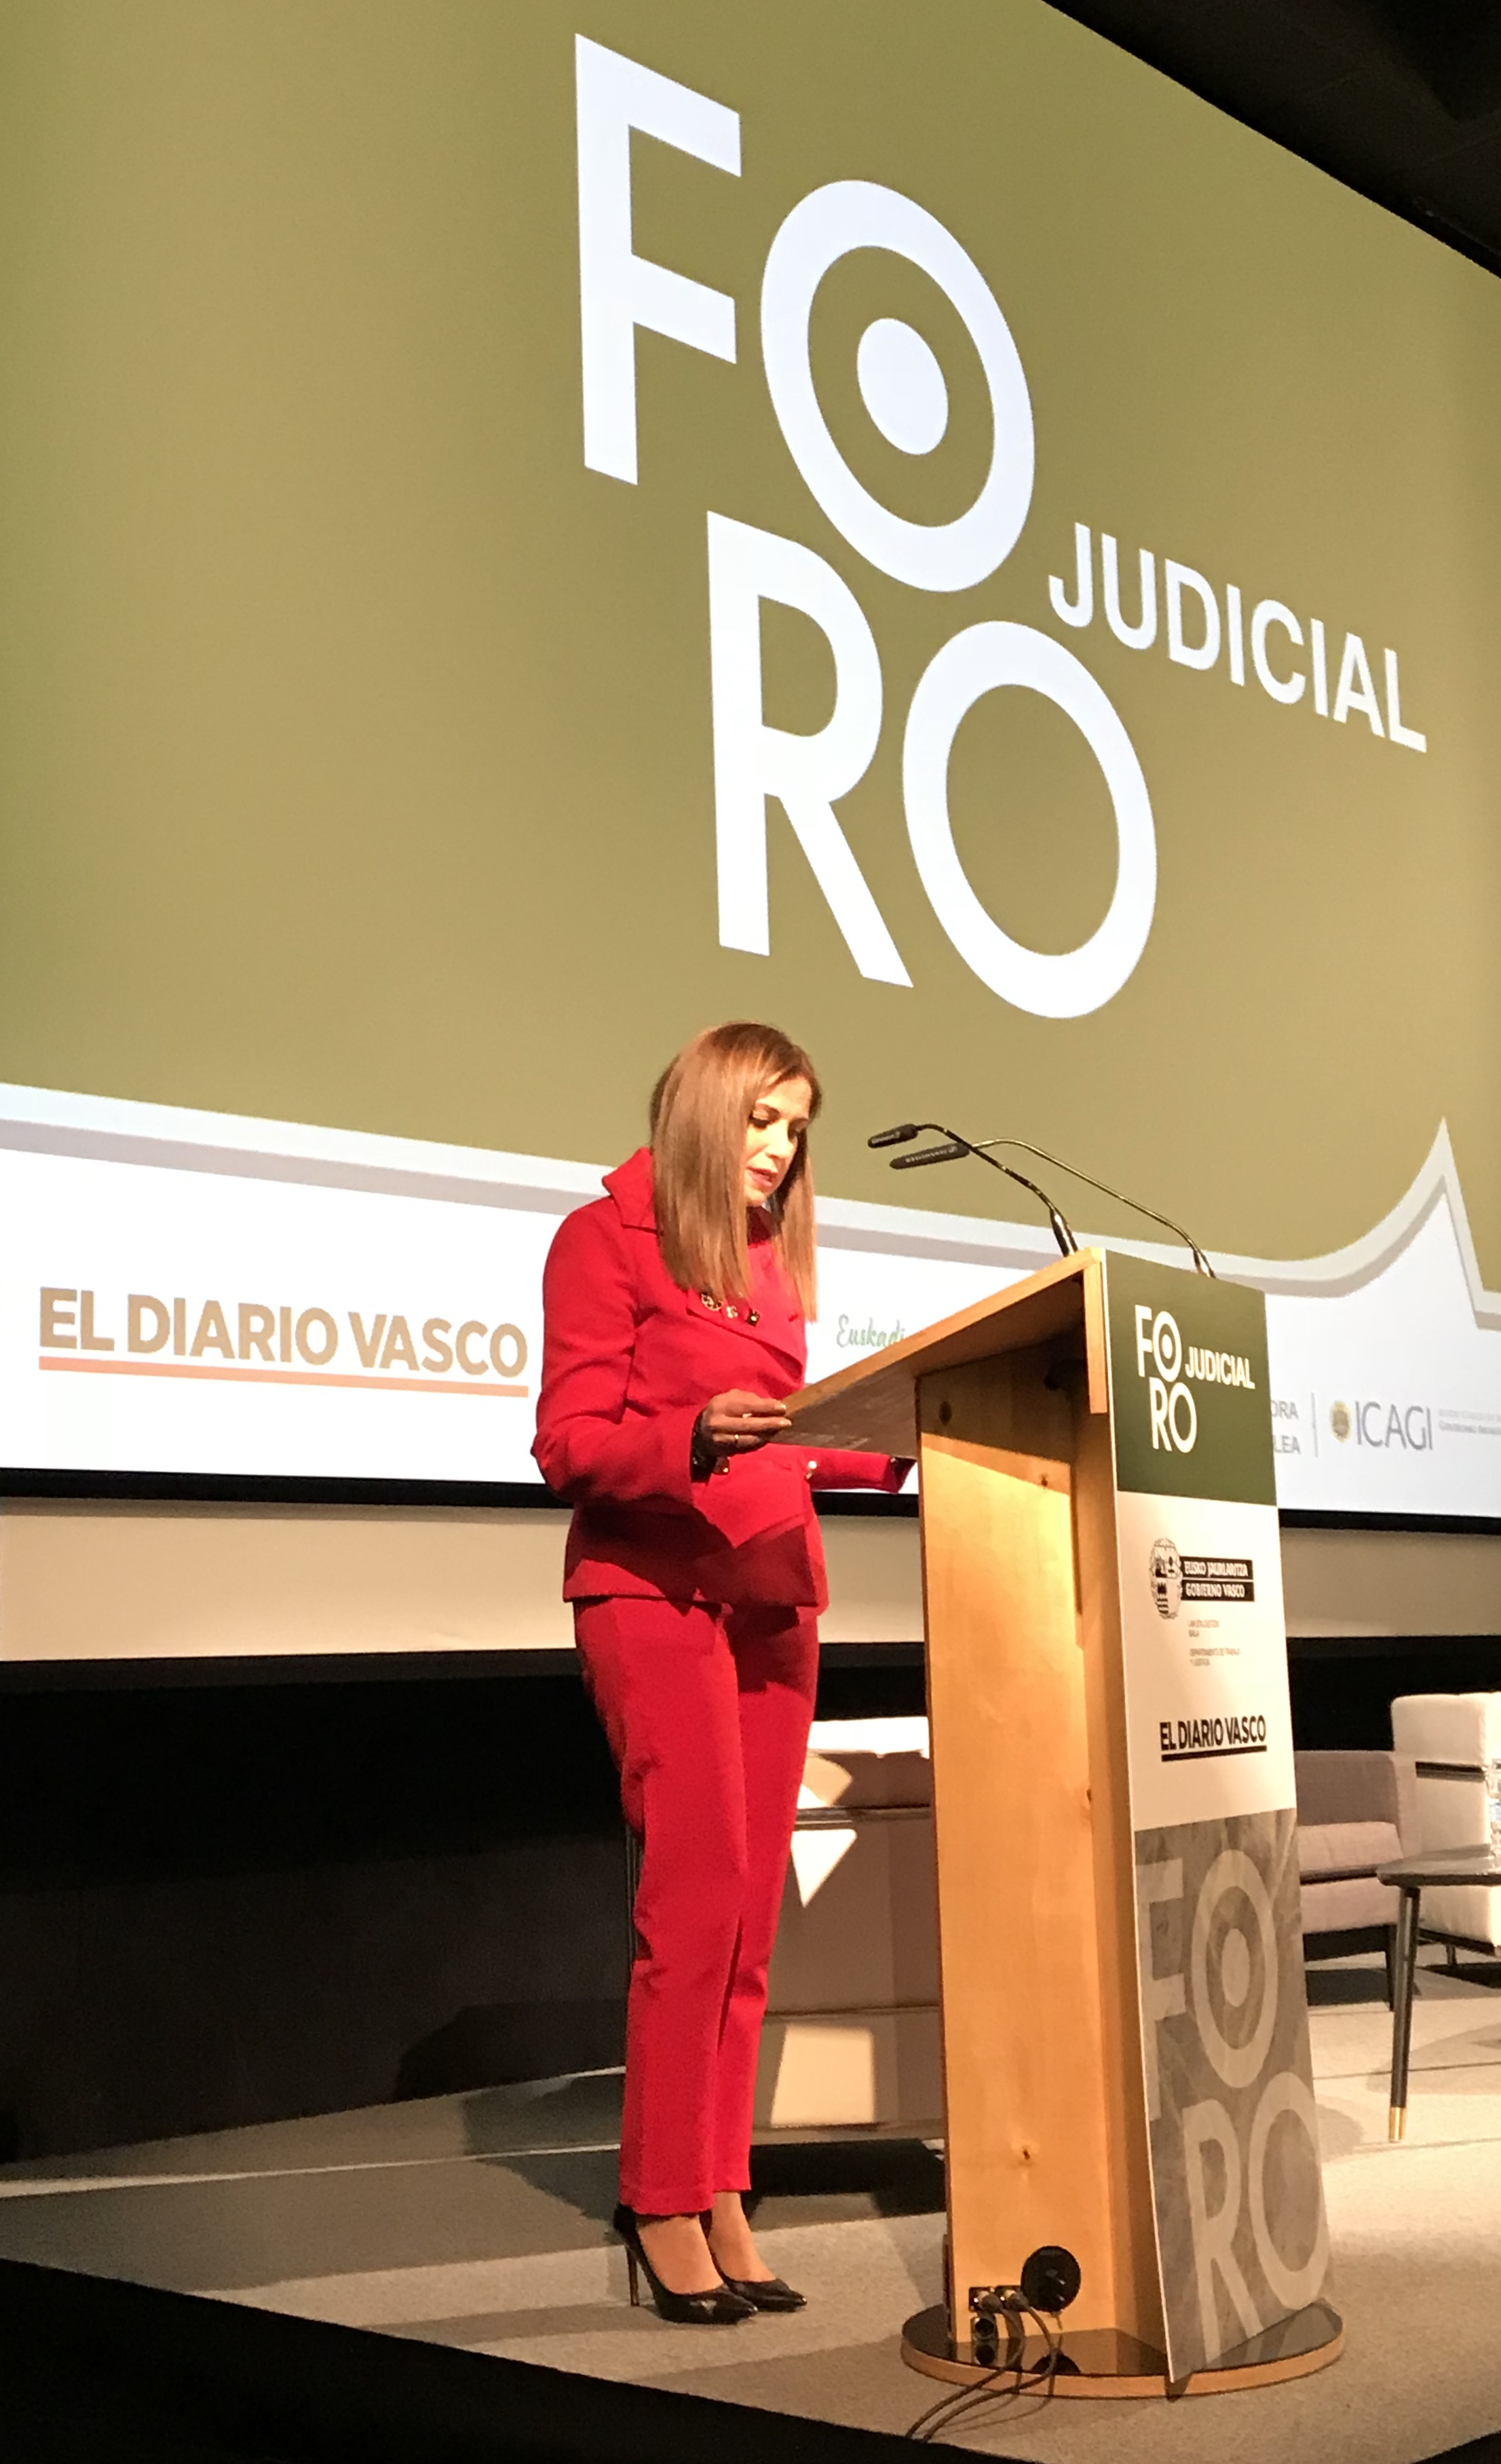 san_jose_foro_judicial_02.jpg